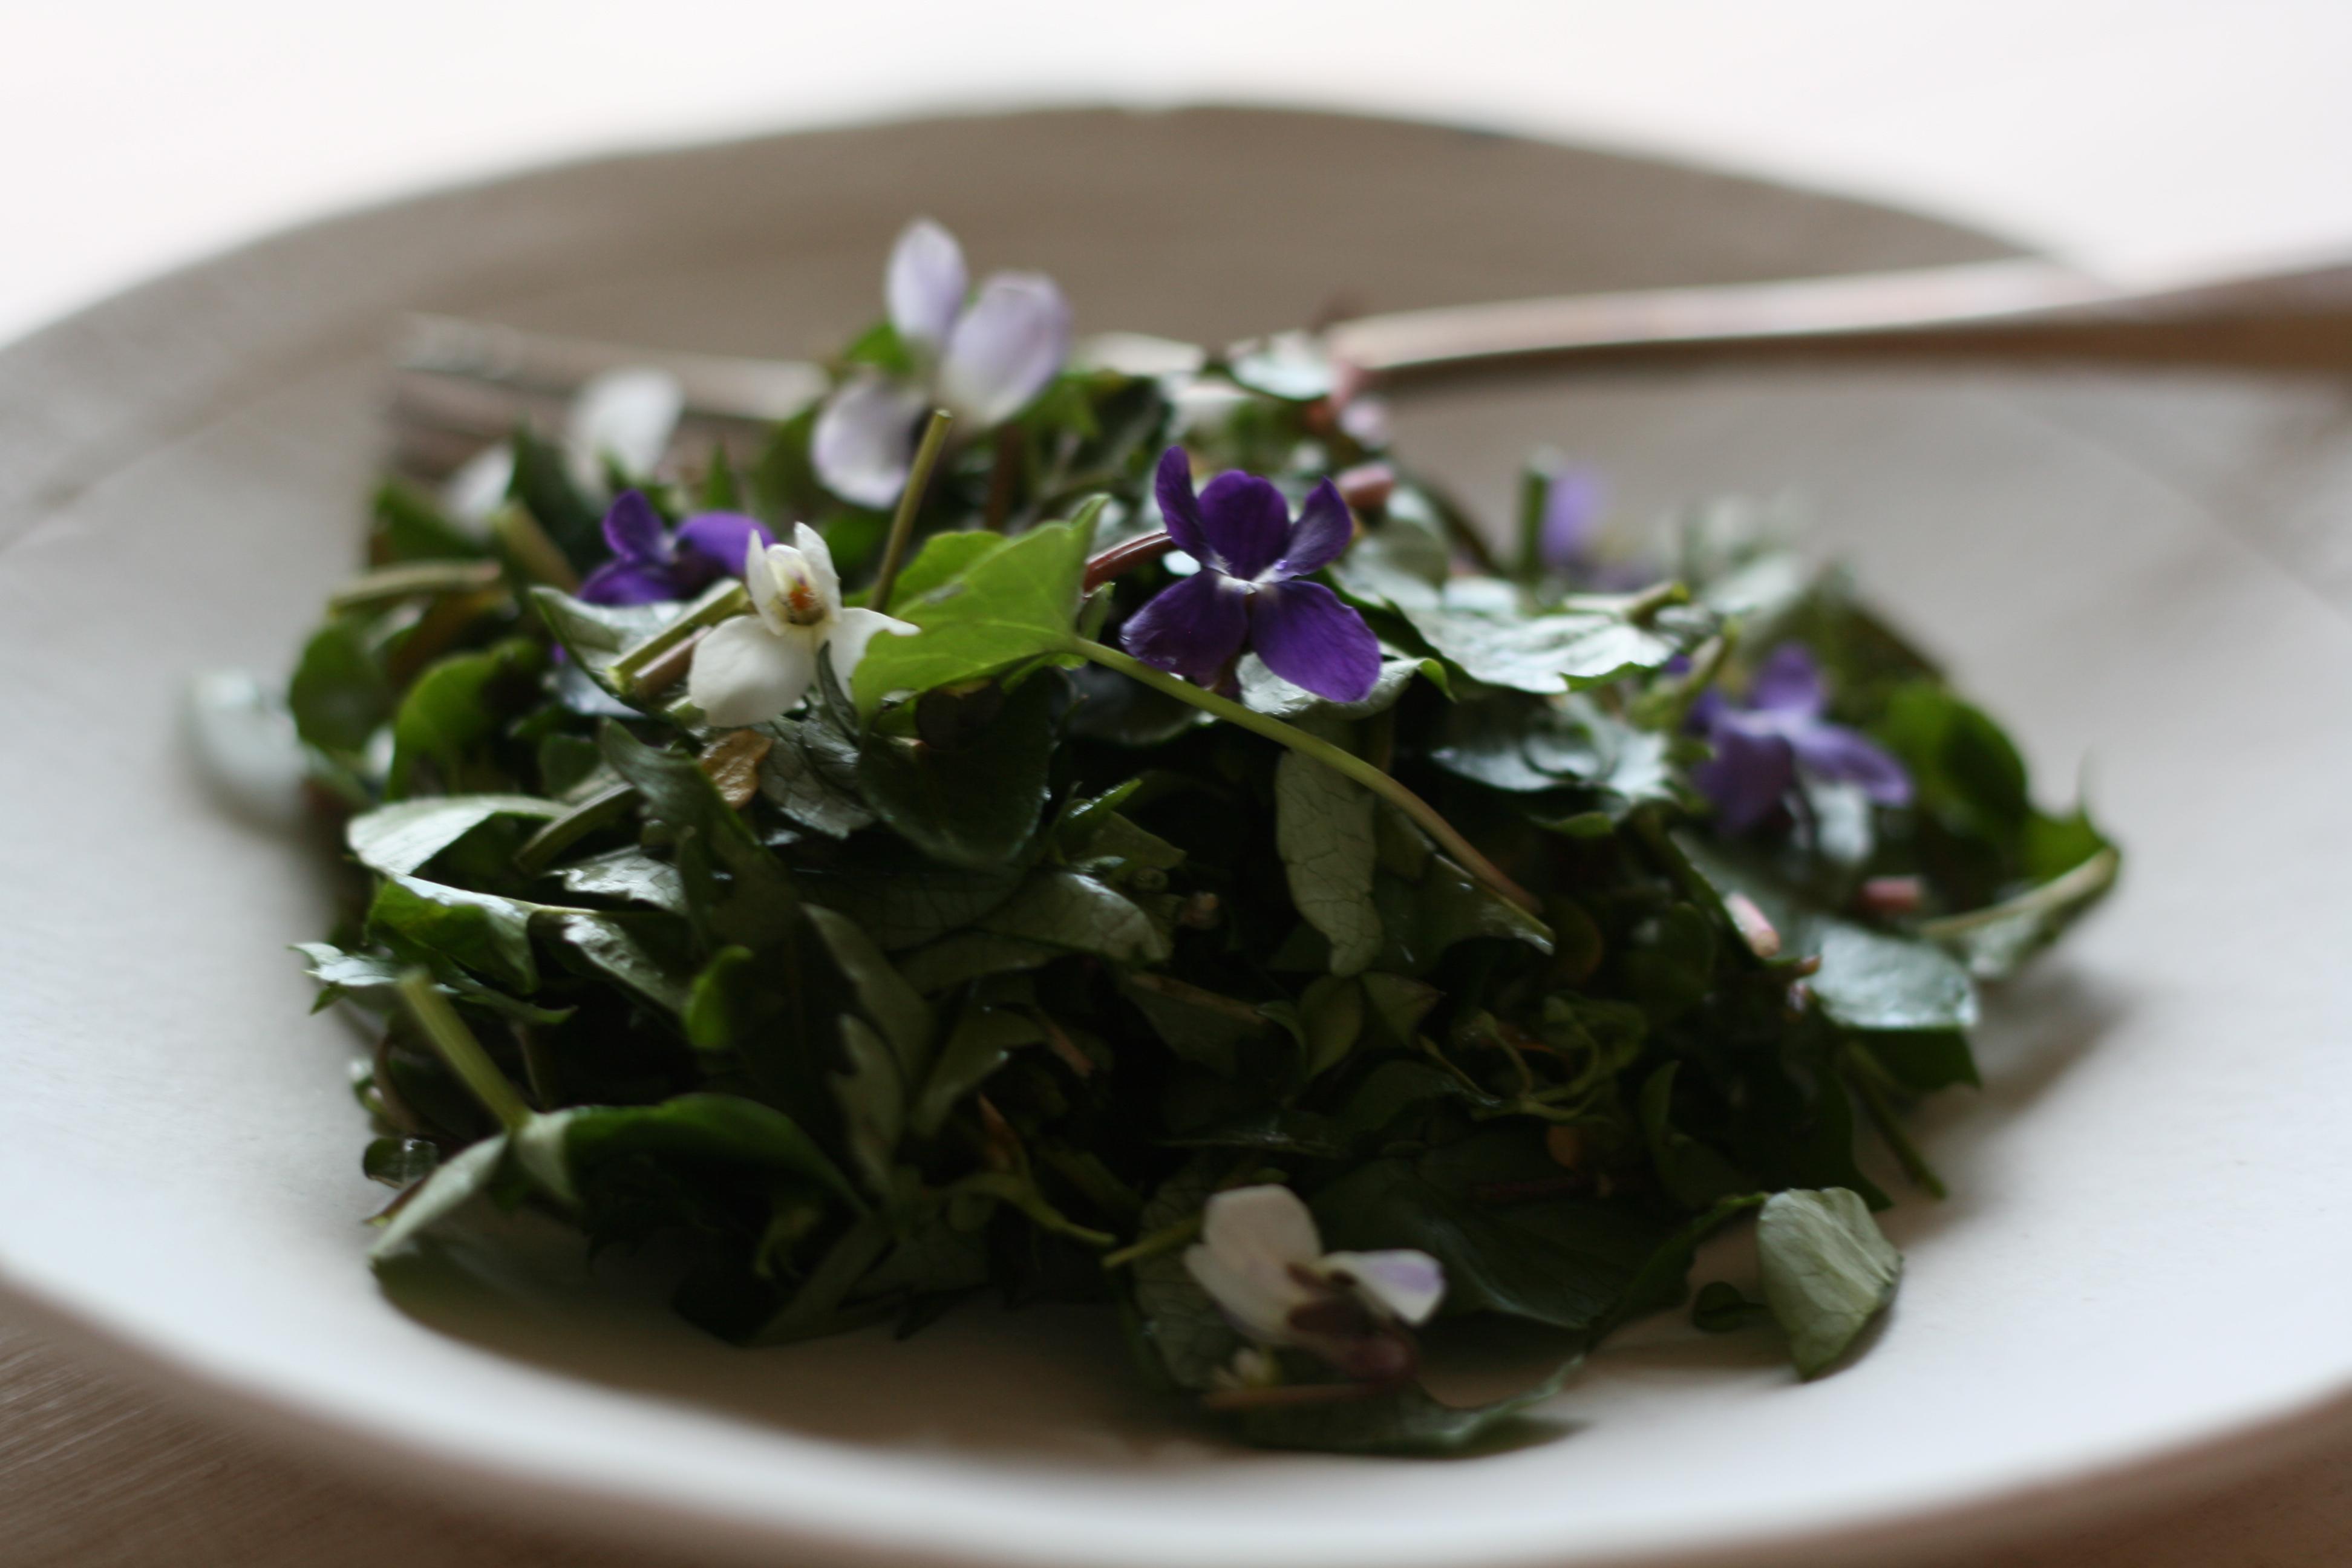 5ef-wildgreens_violet_salad3_jpg_masolata.jpg